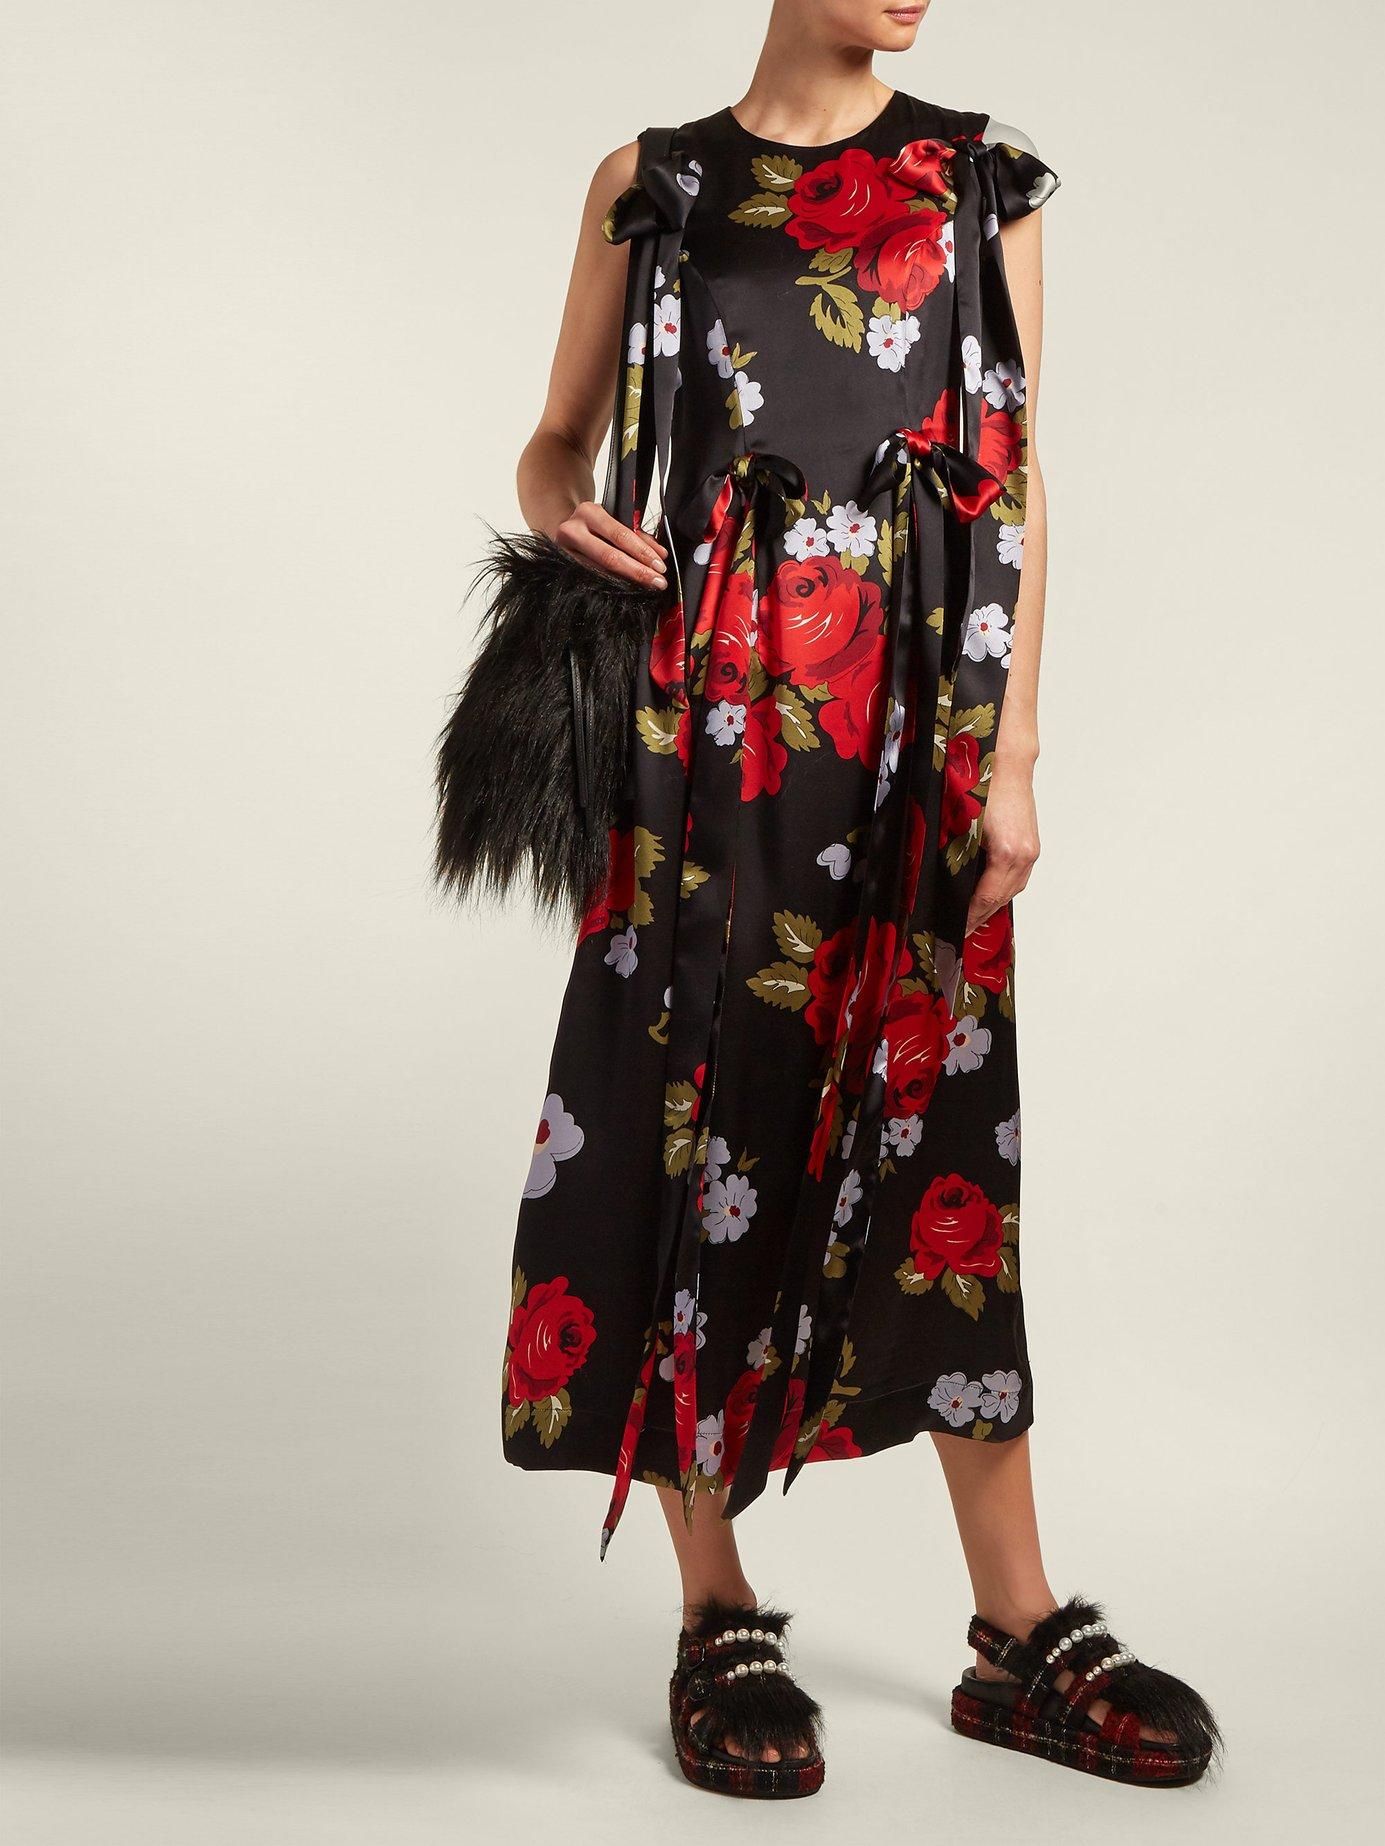 Bow-trim floral-print silk-satin dress by Simone Rocha